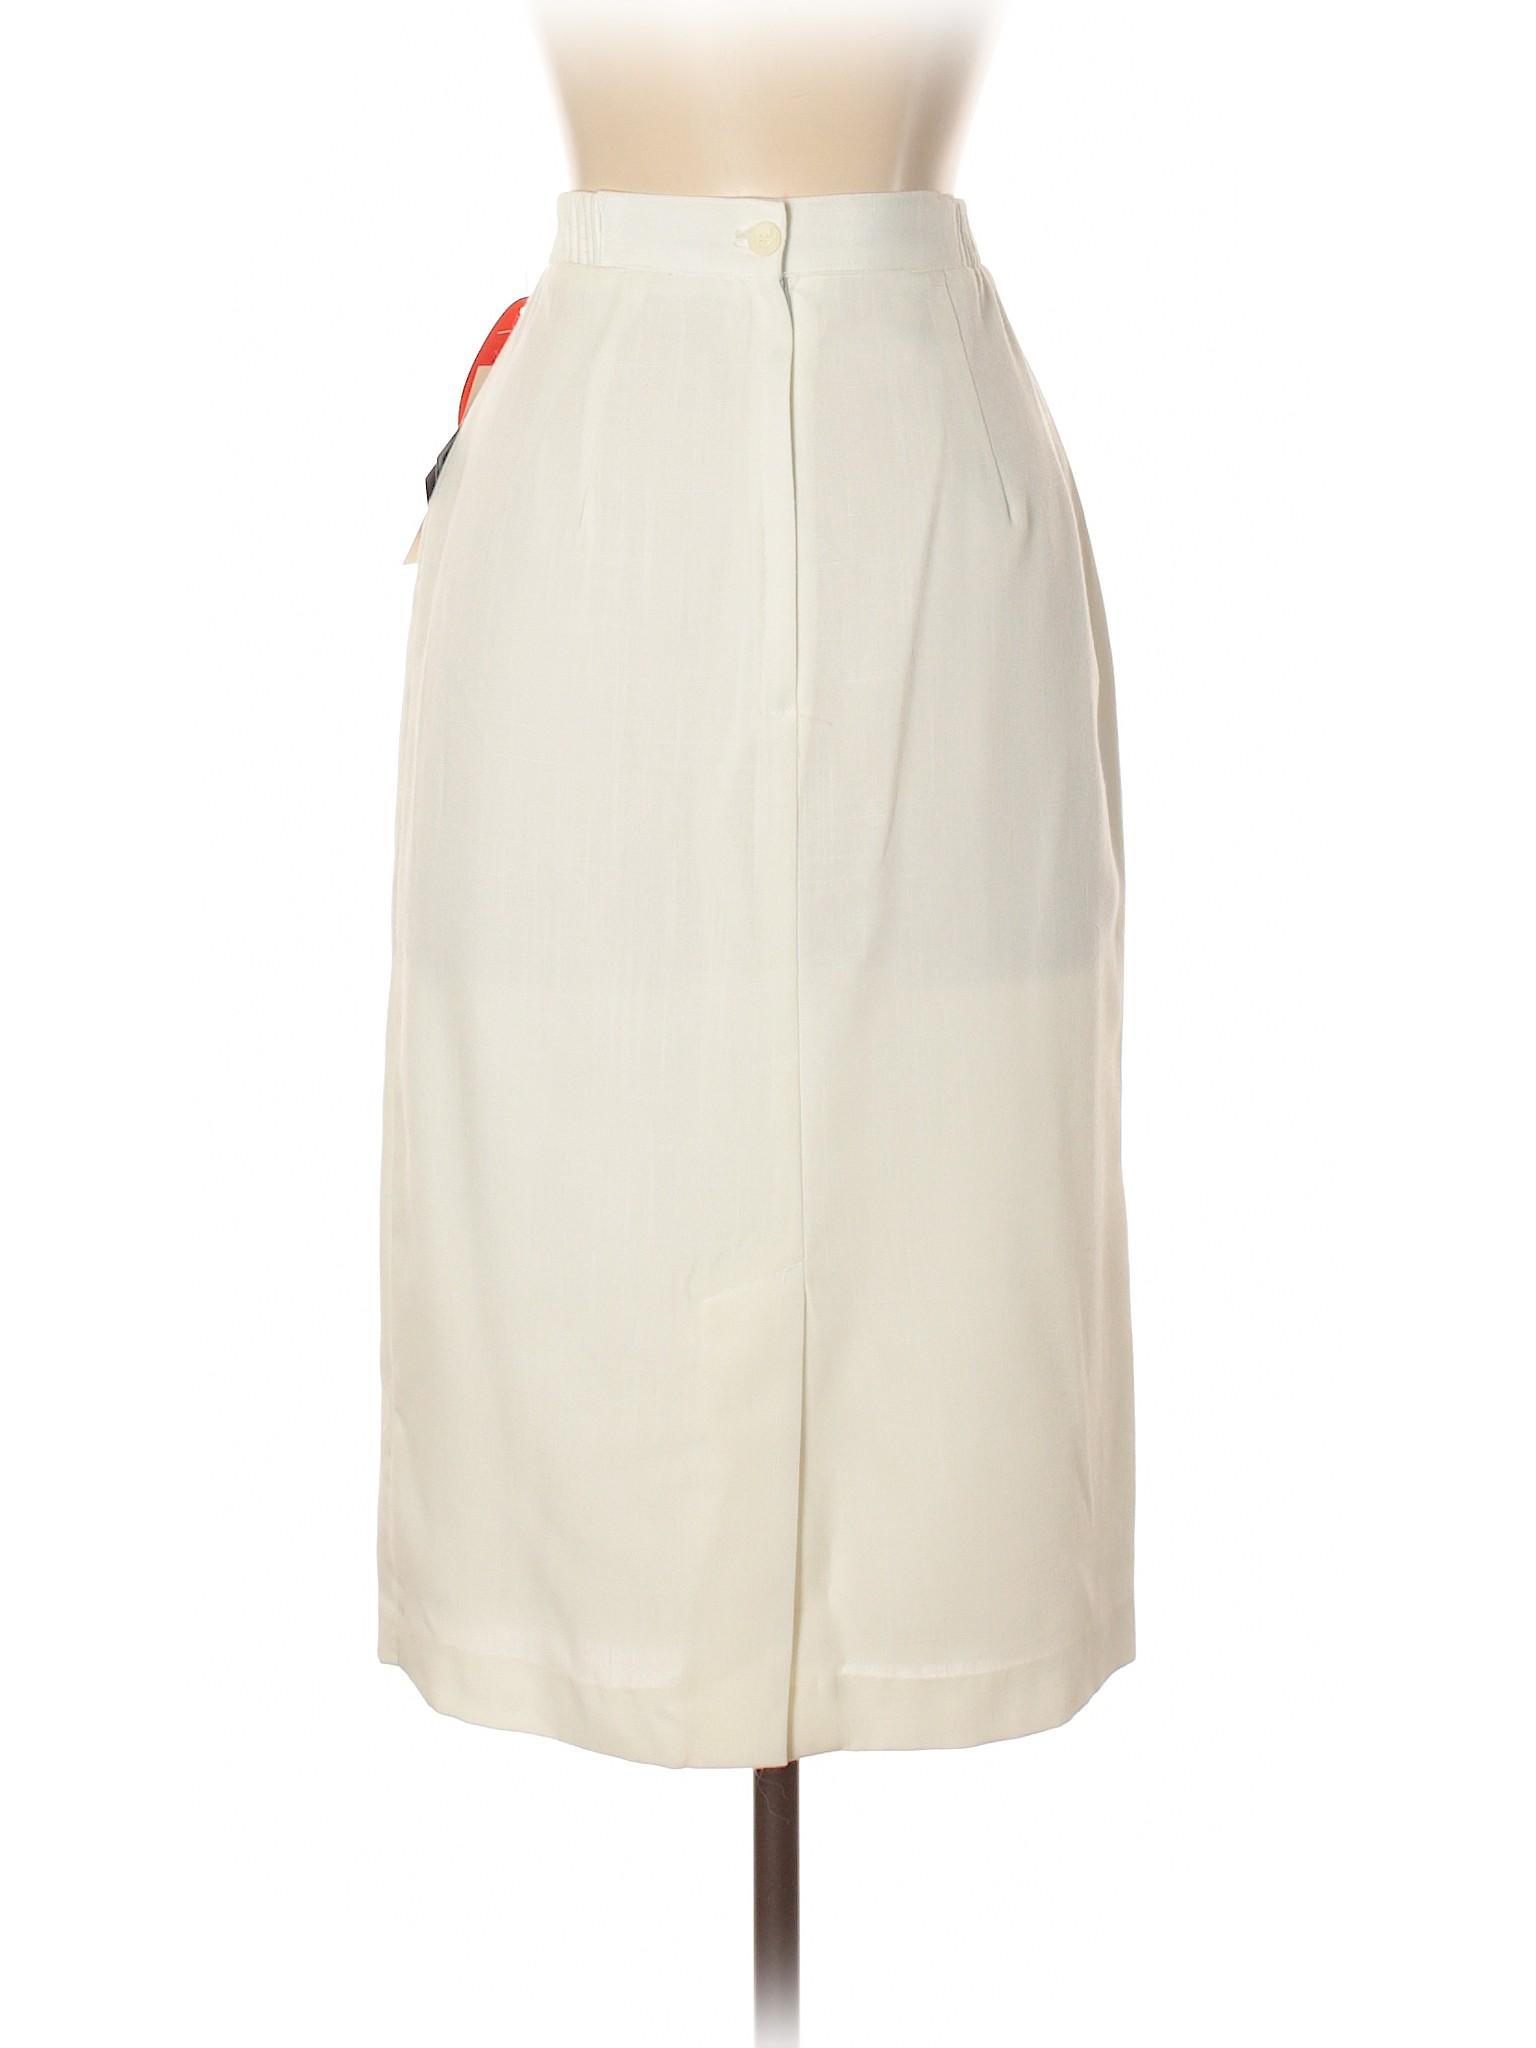 Boutique Skirt Casual Boutique Skirt Casual Skirt Boutique Casual Boutique qppwtZO